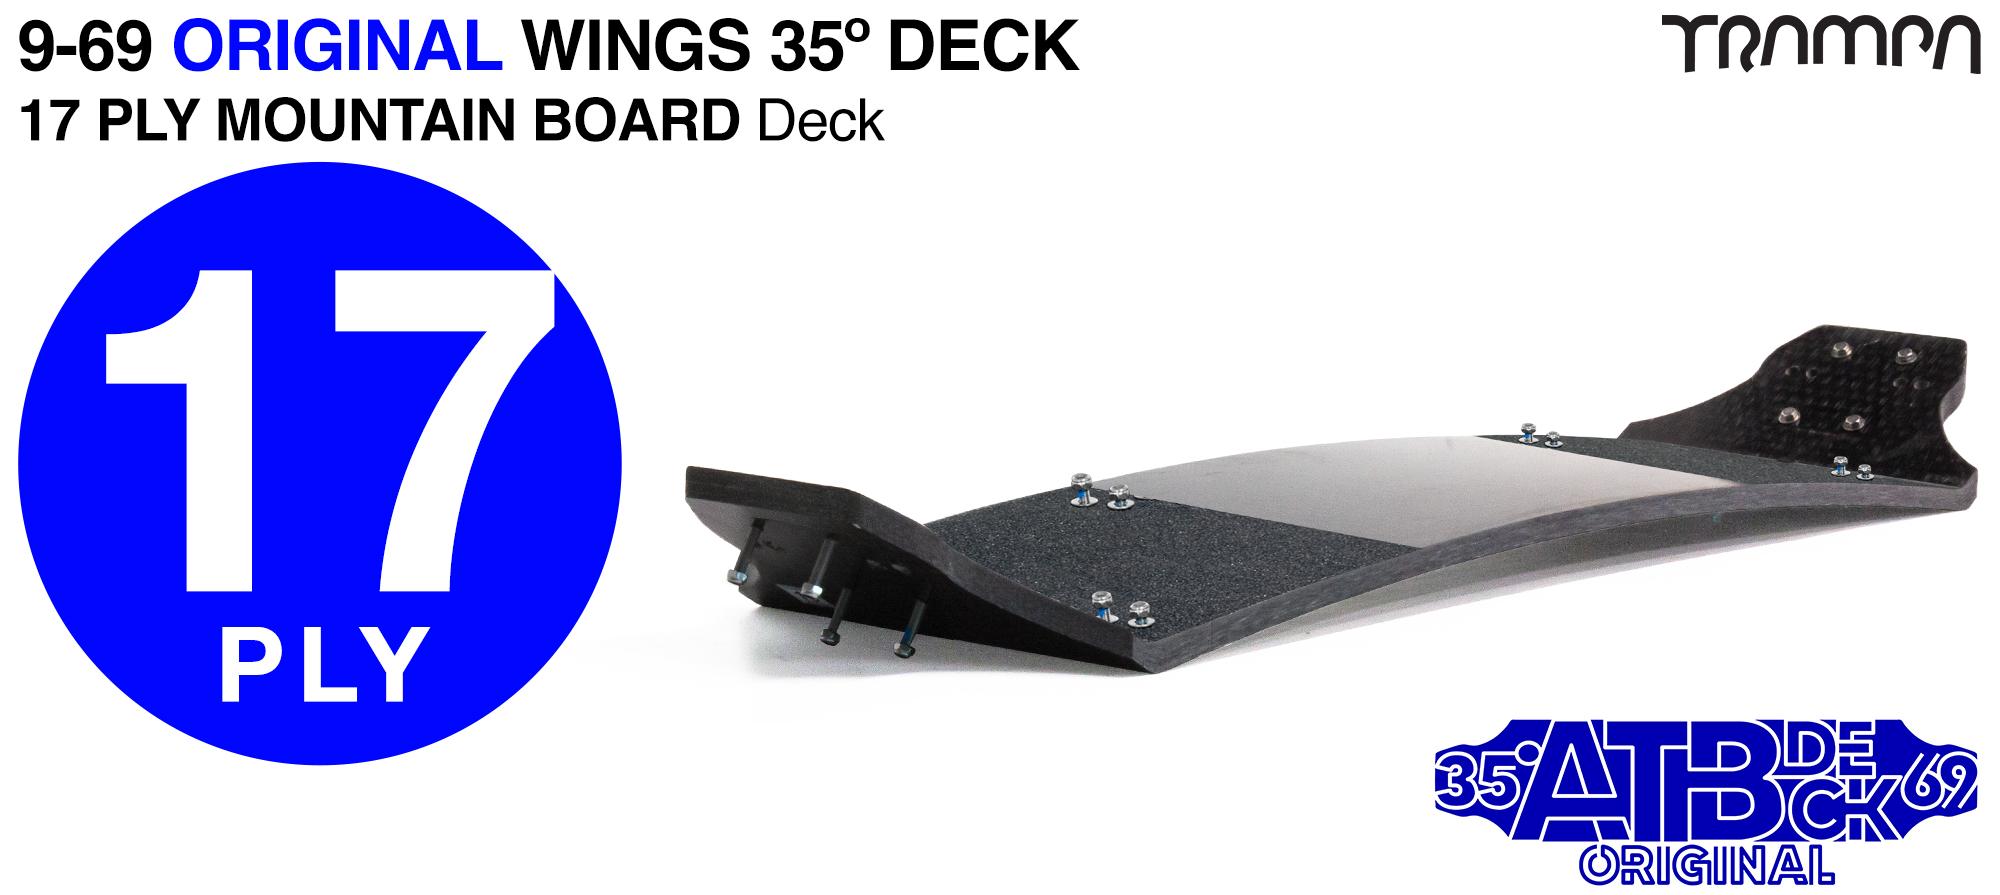 17ply 9-69 35º Gripped Mountainboard Deck - STIFFER